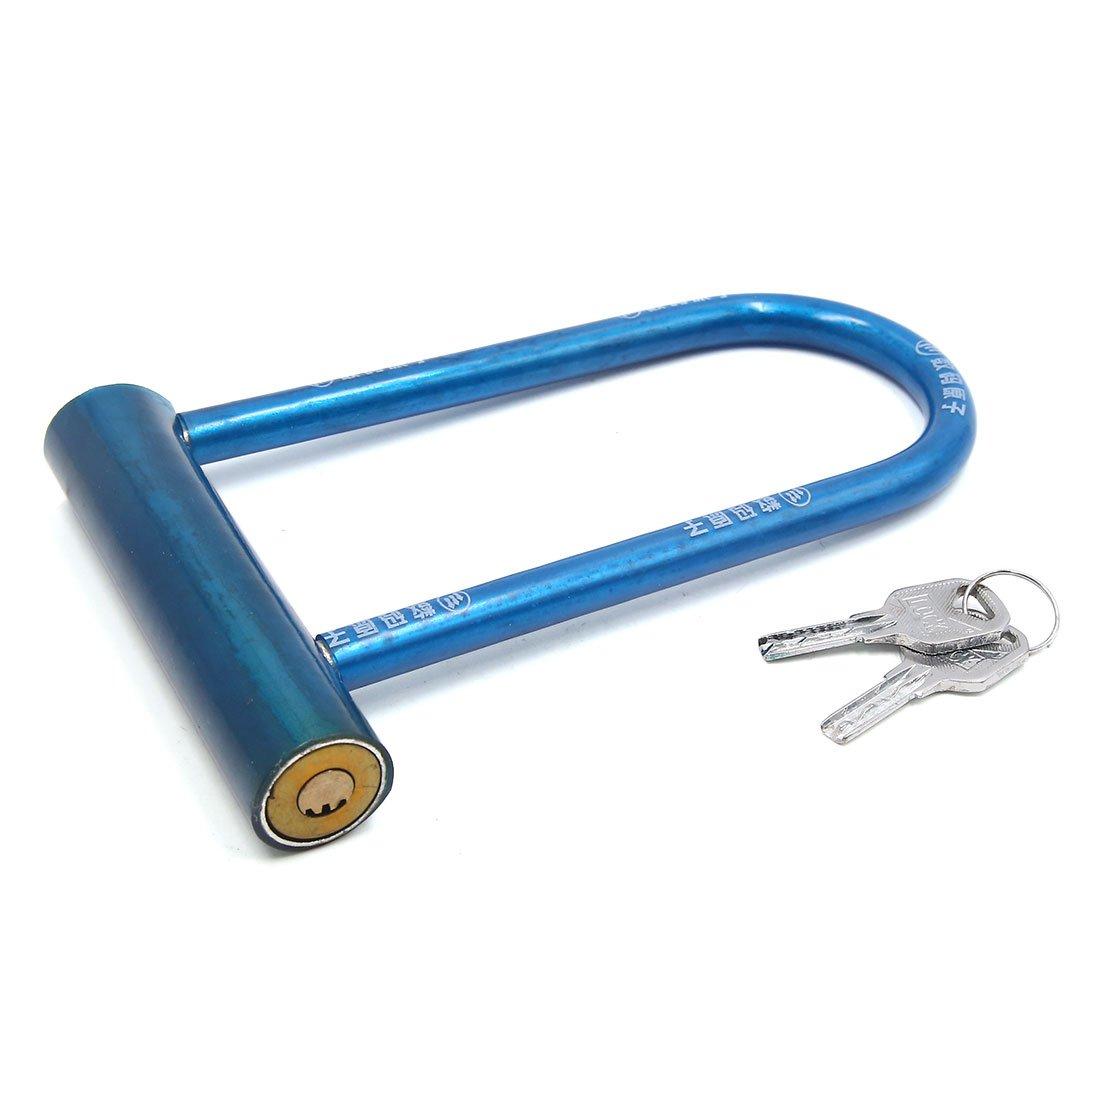 uxcell Blue Metal U Shape Bike Bicycle Cycling Anti Thief Security Lock with 2 Keys